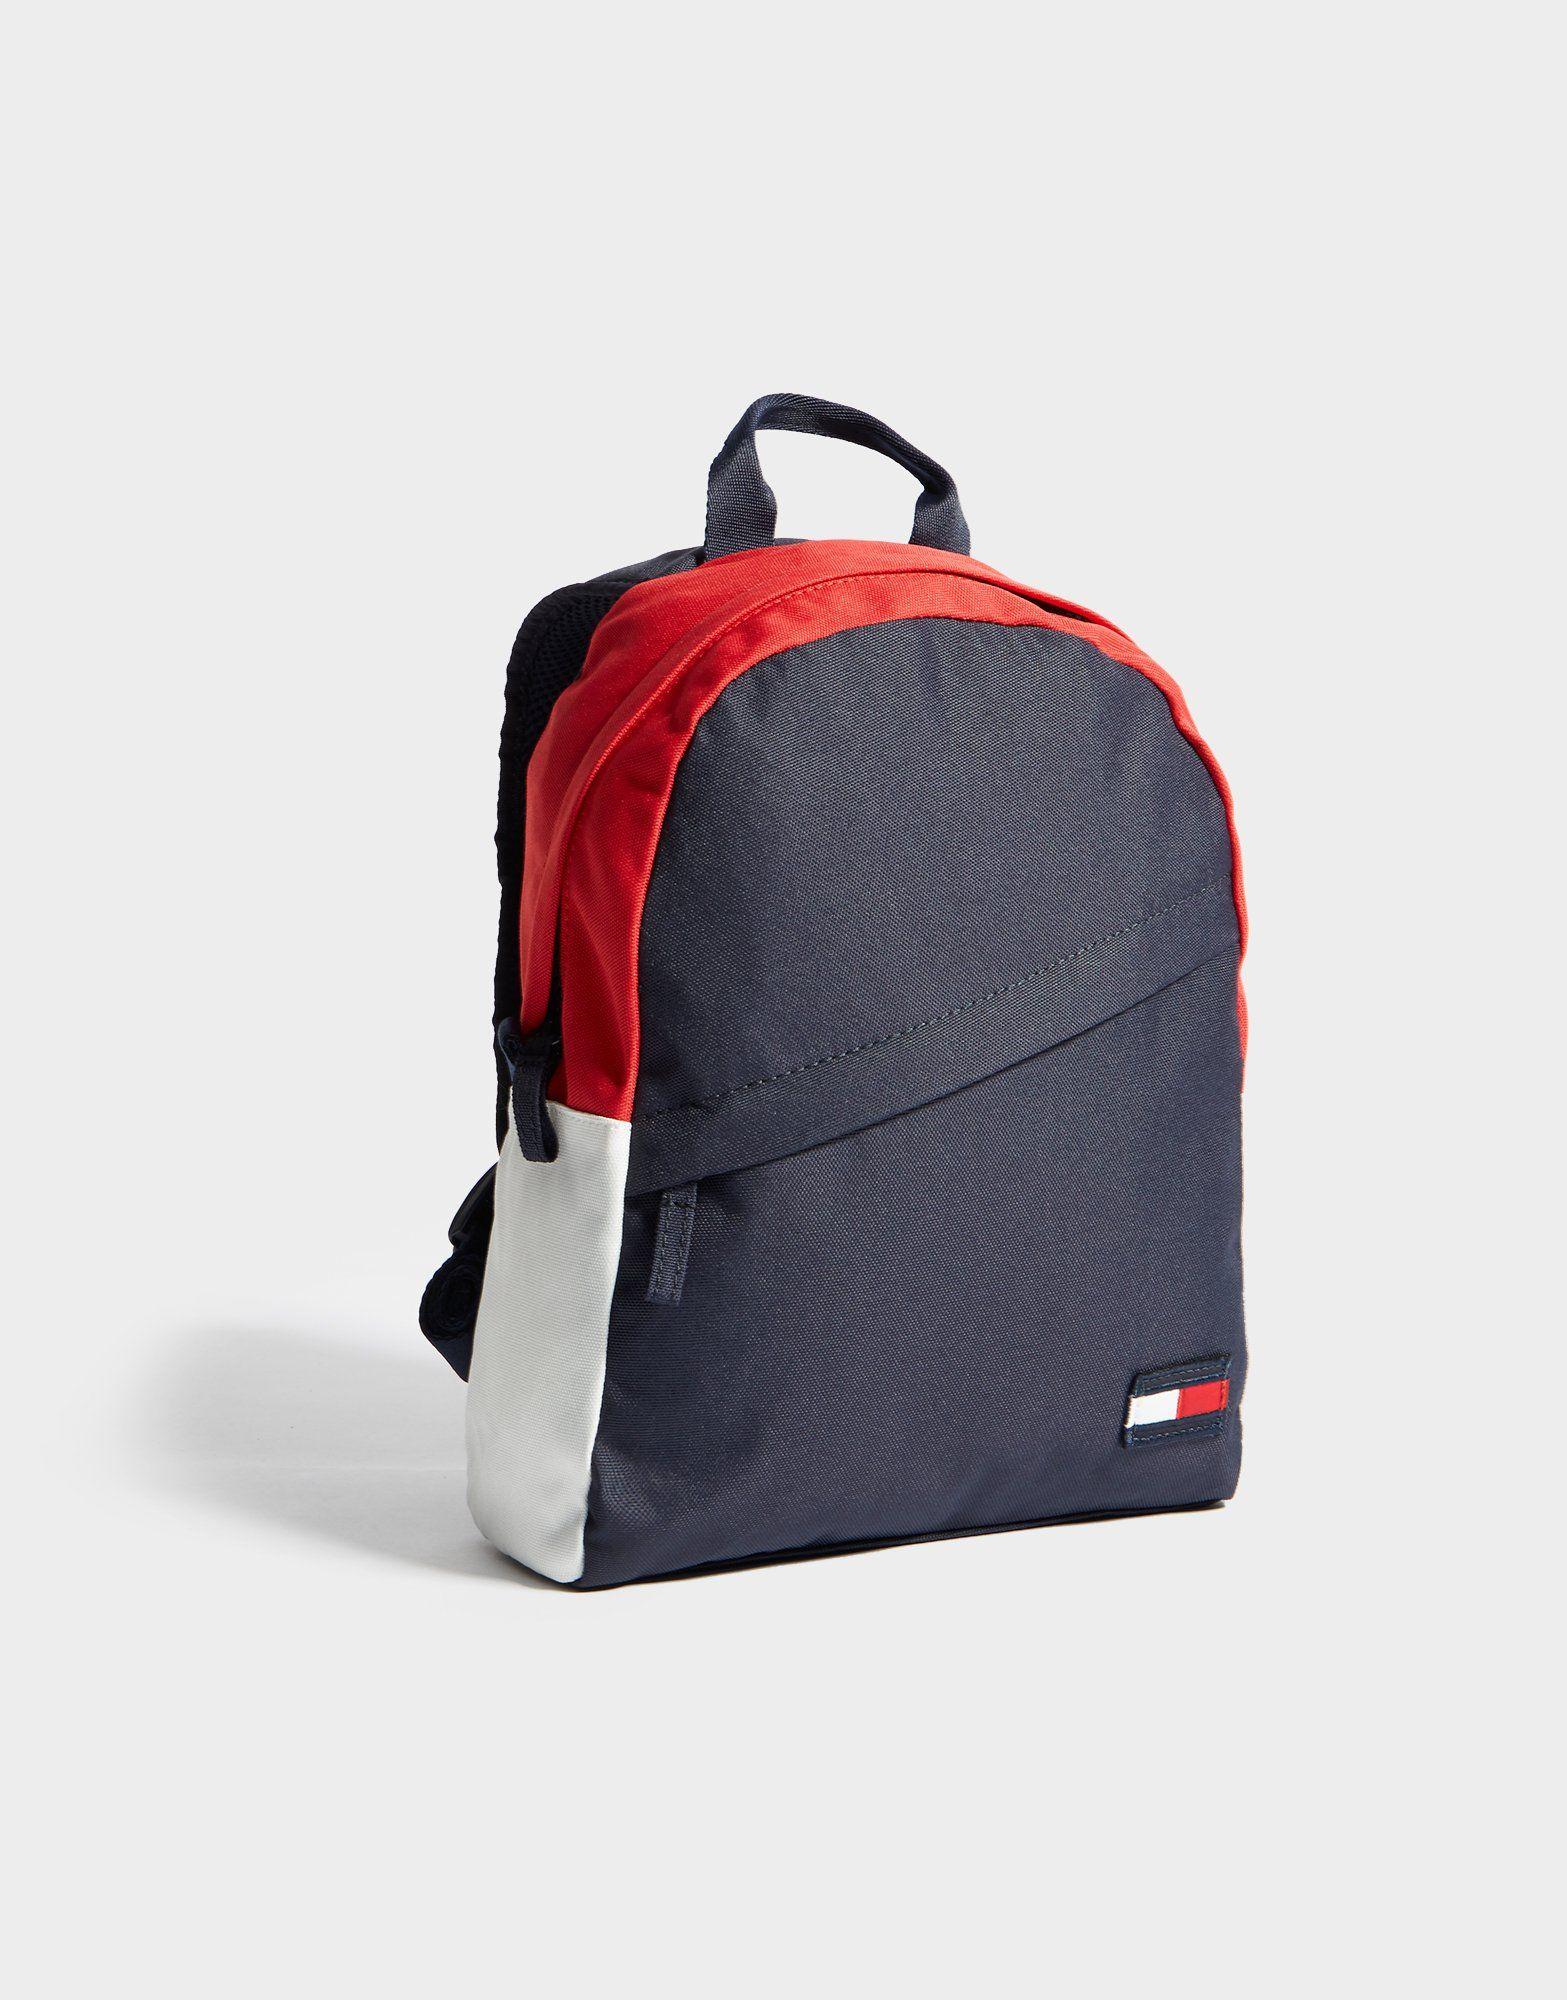 6be5f14da5df Jd Sports Mini Backpack- Fenix Toulouse Handball